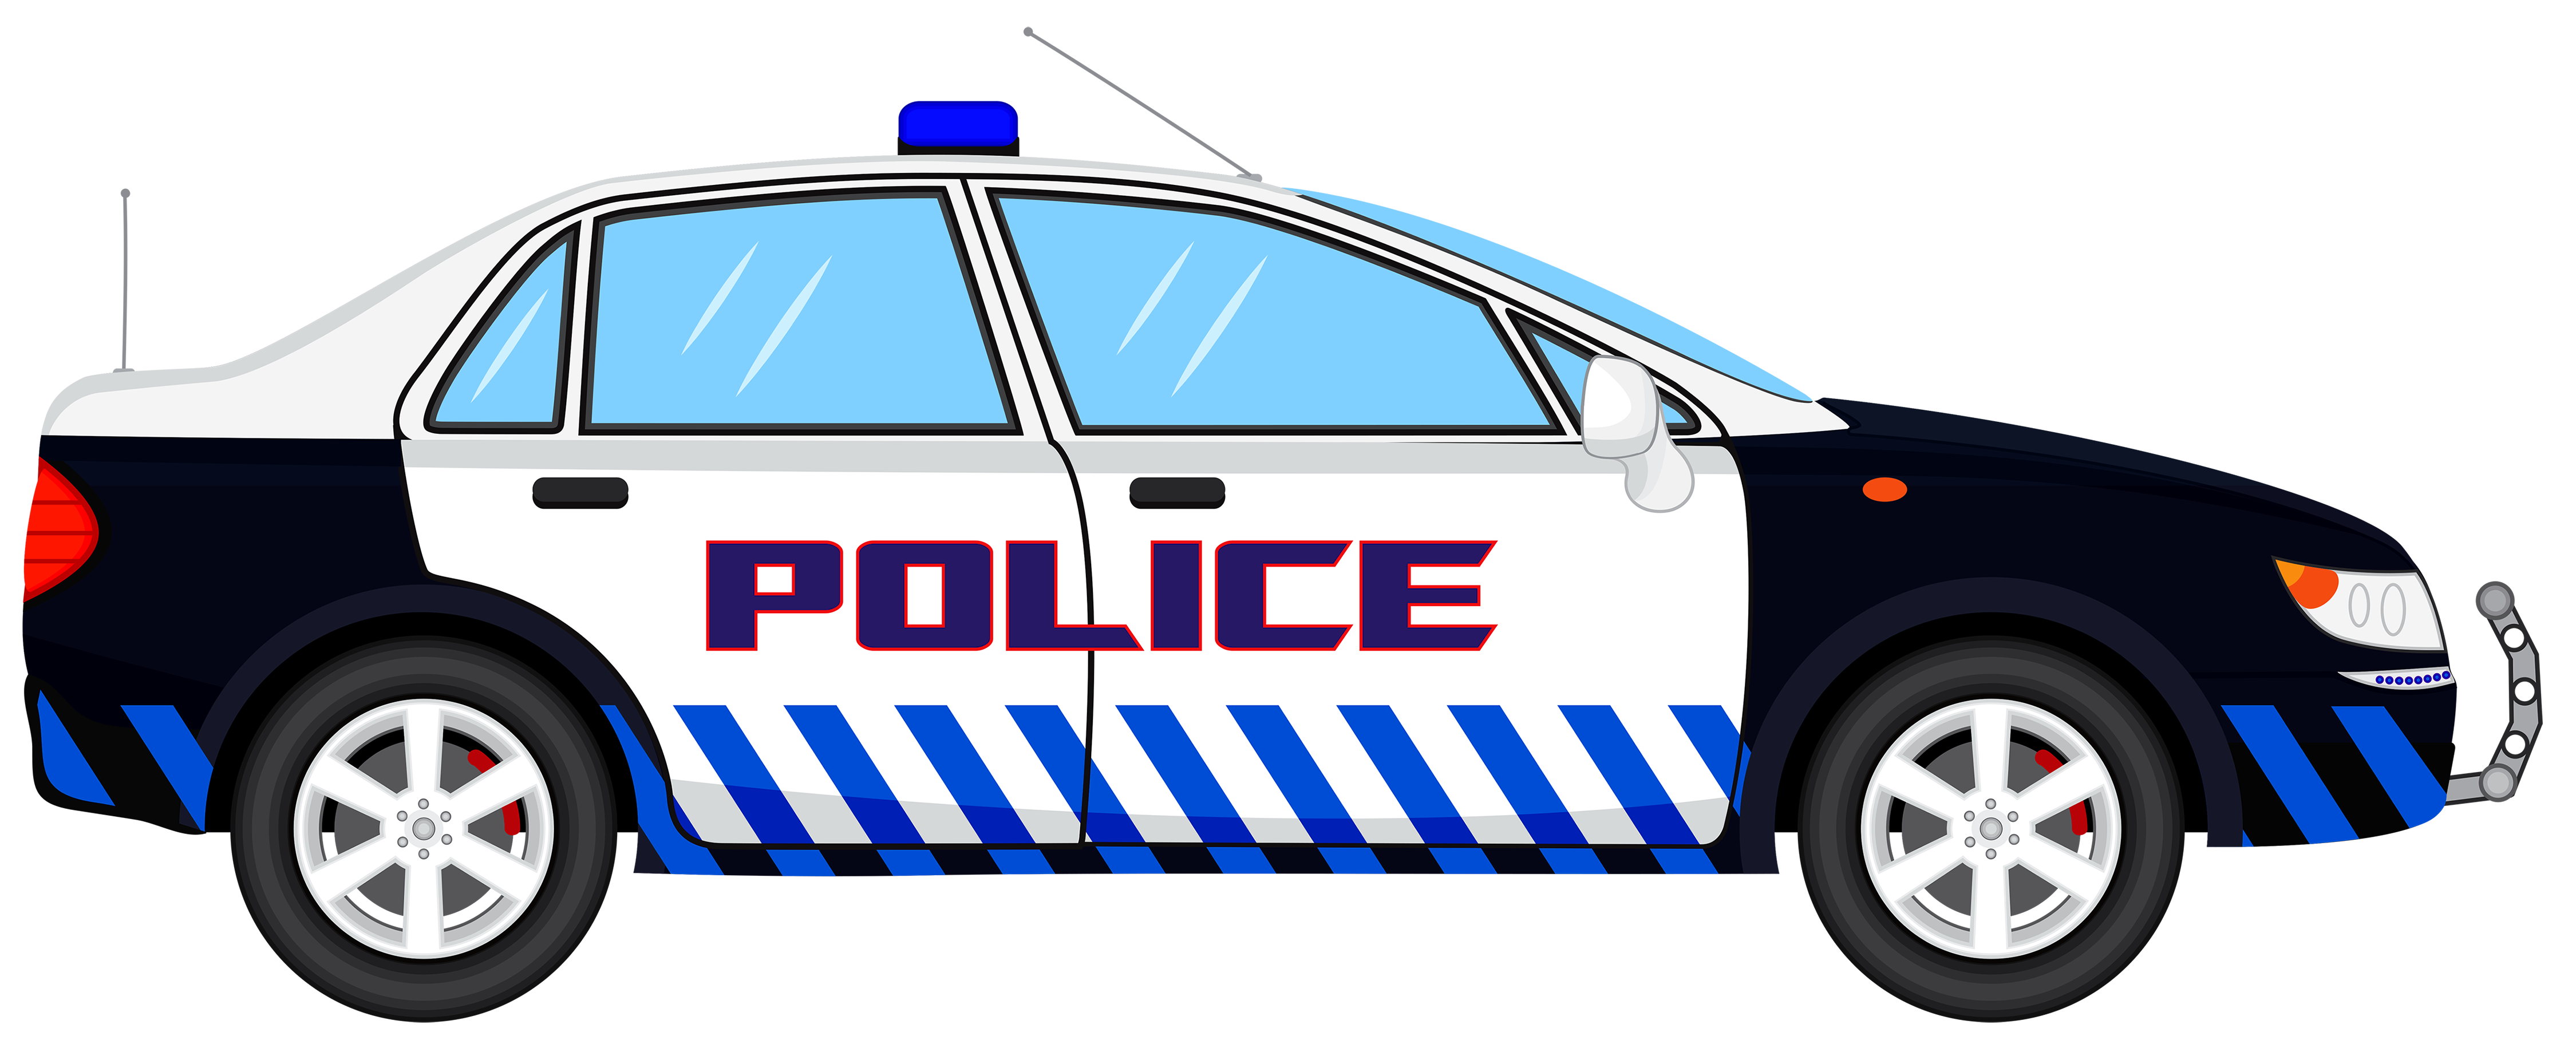 Police car transparent clip art image